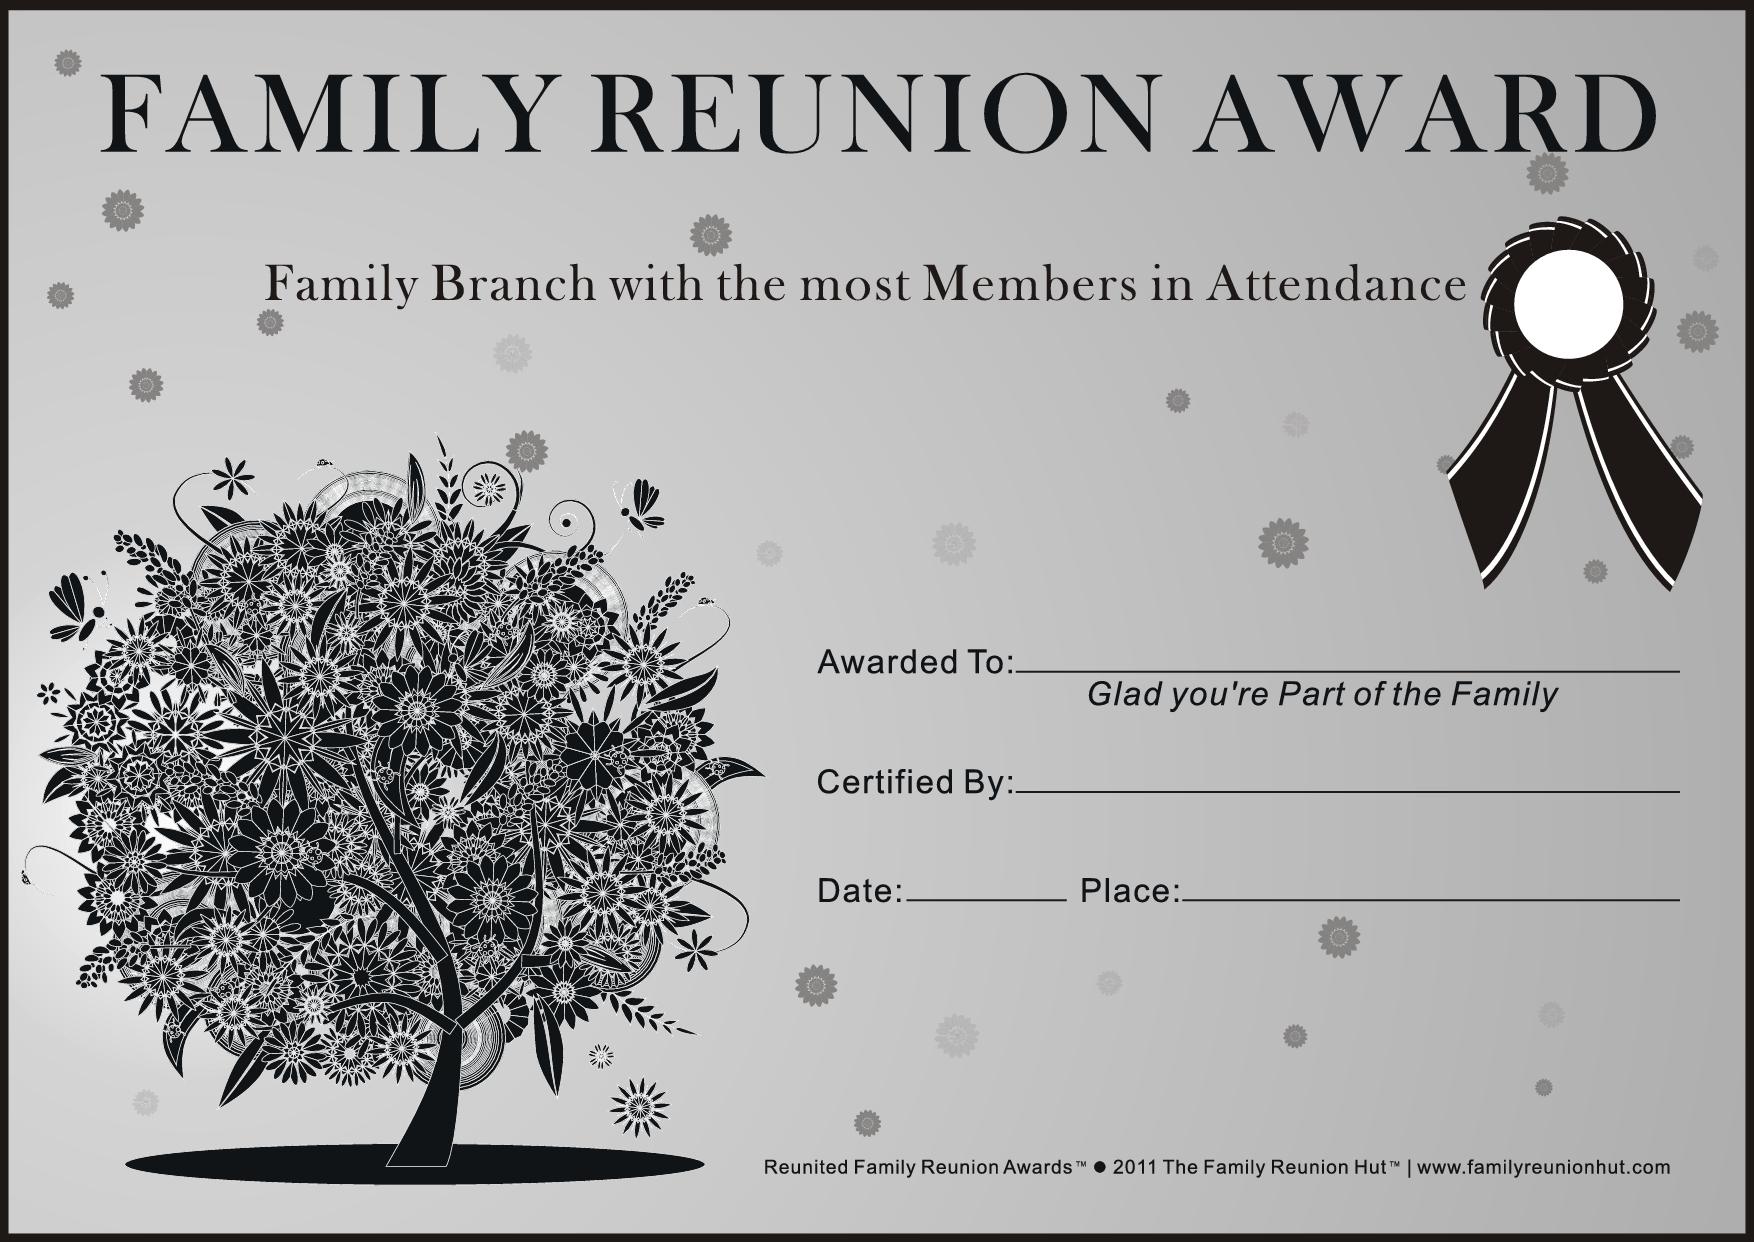 Family Reunion Ideas | Family Reunion Certificates - Oak Passion 2 - Free Printable Family Reunion Awards